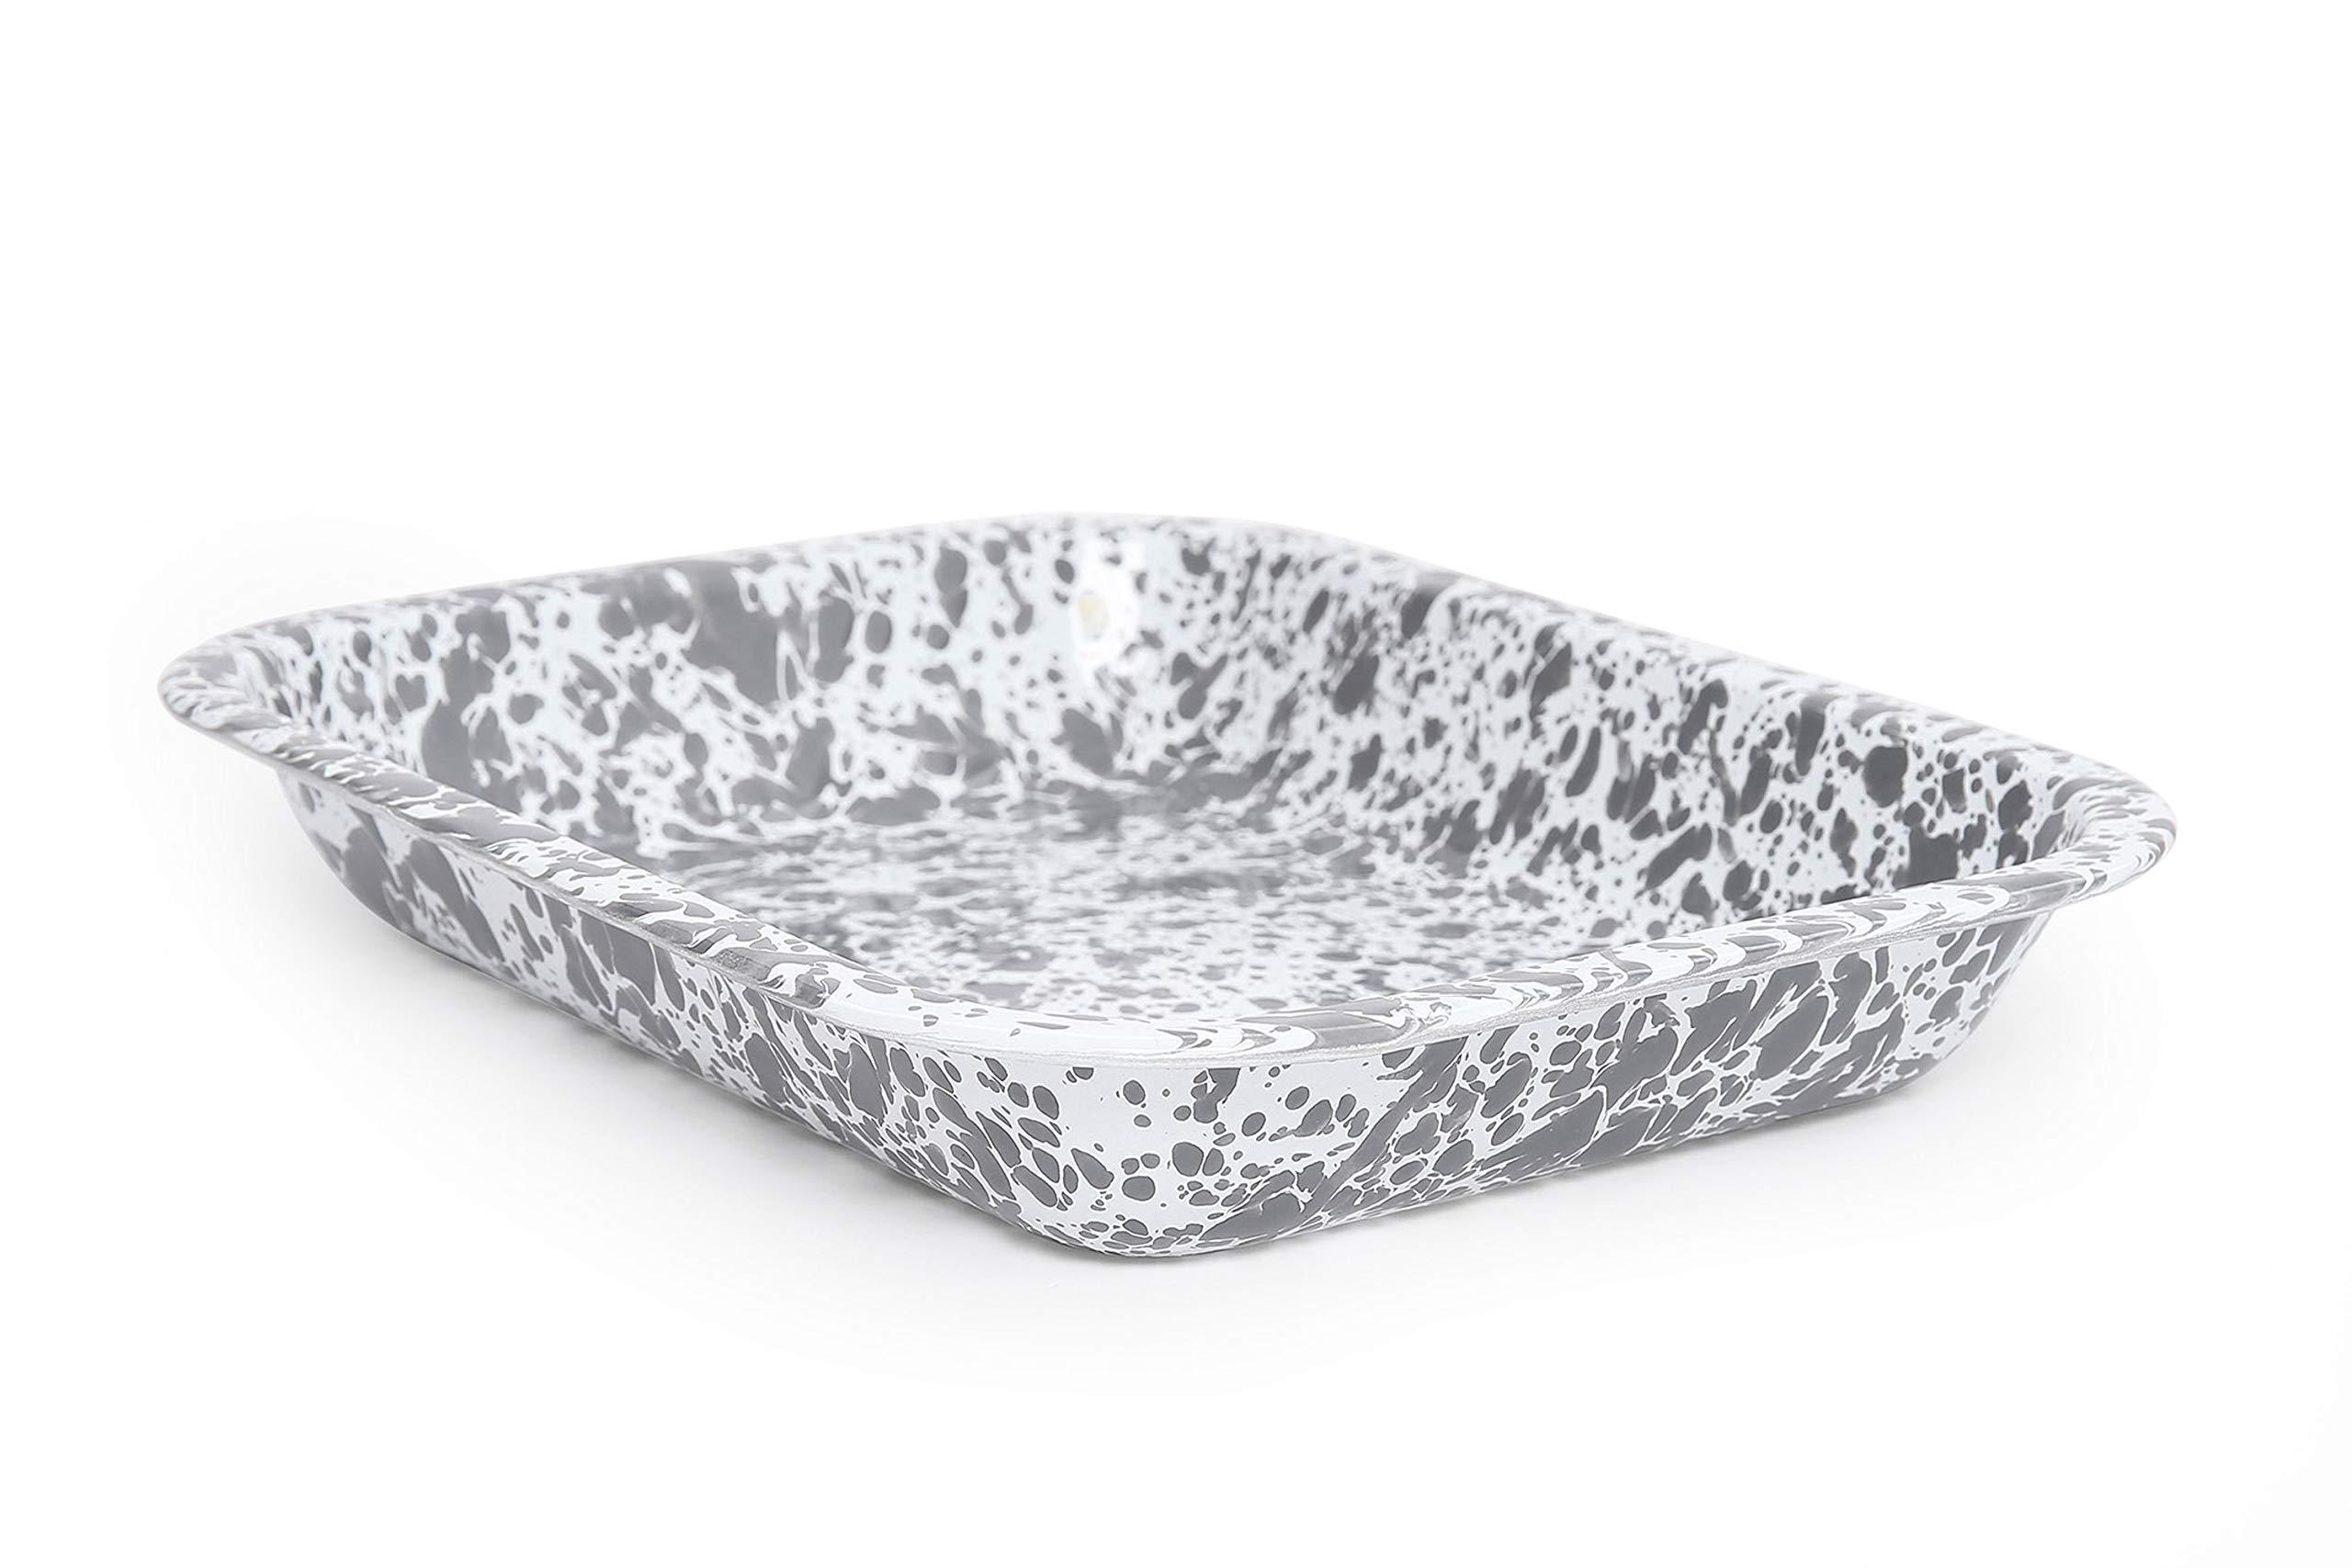 Enamelware Open Roaster, 10.5 x 8 inches, Grey/White Splatter (Single)